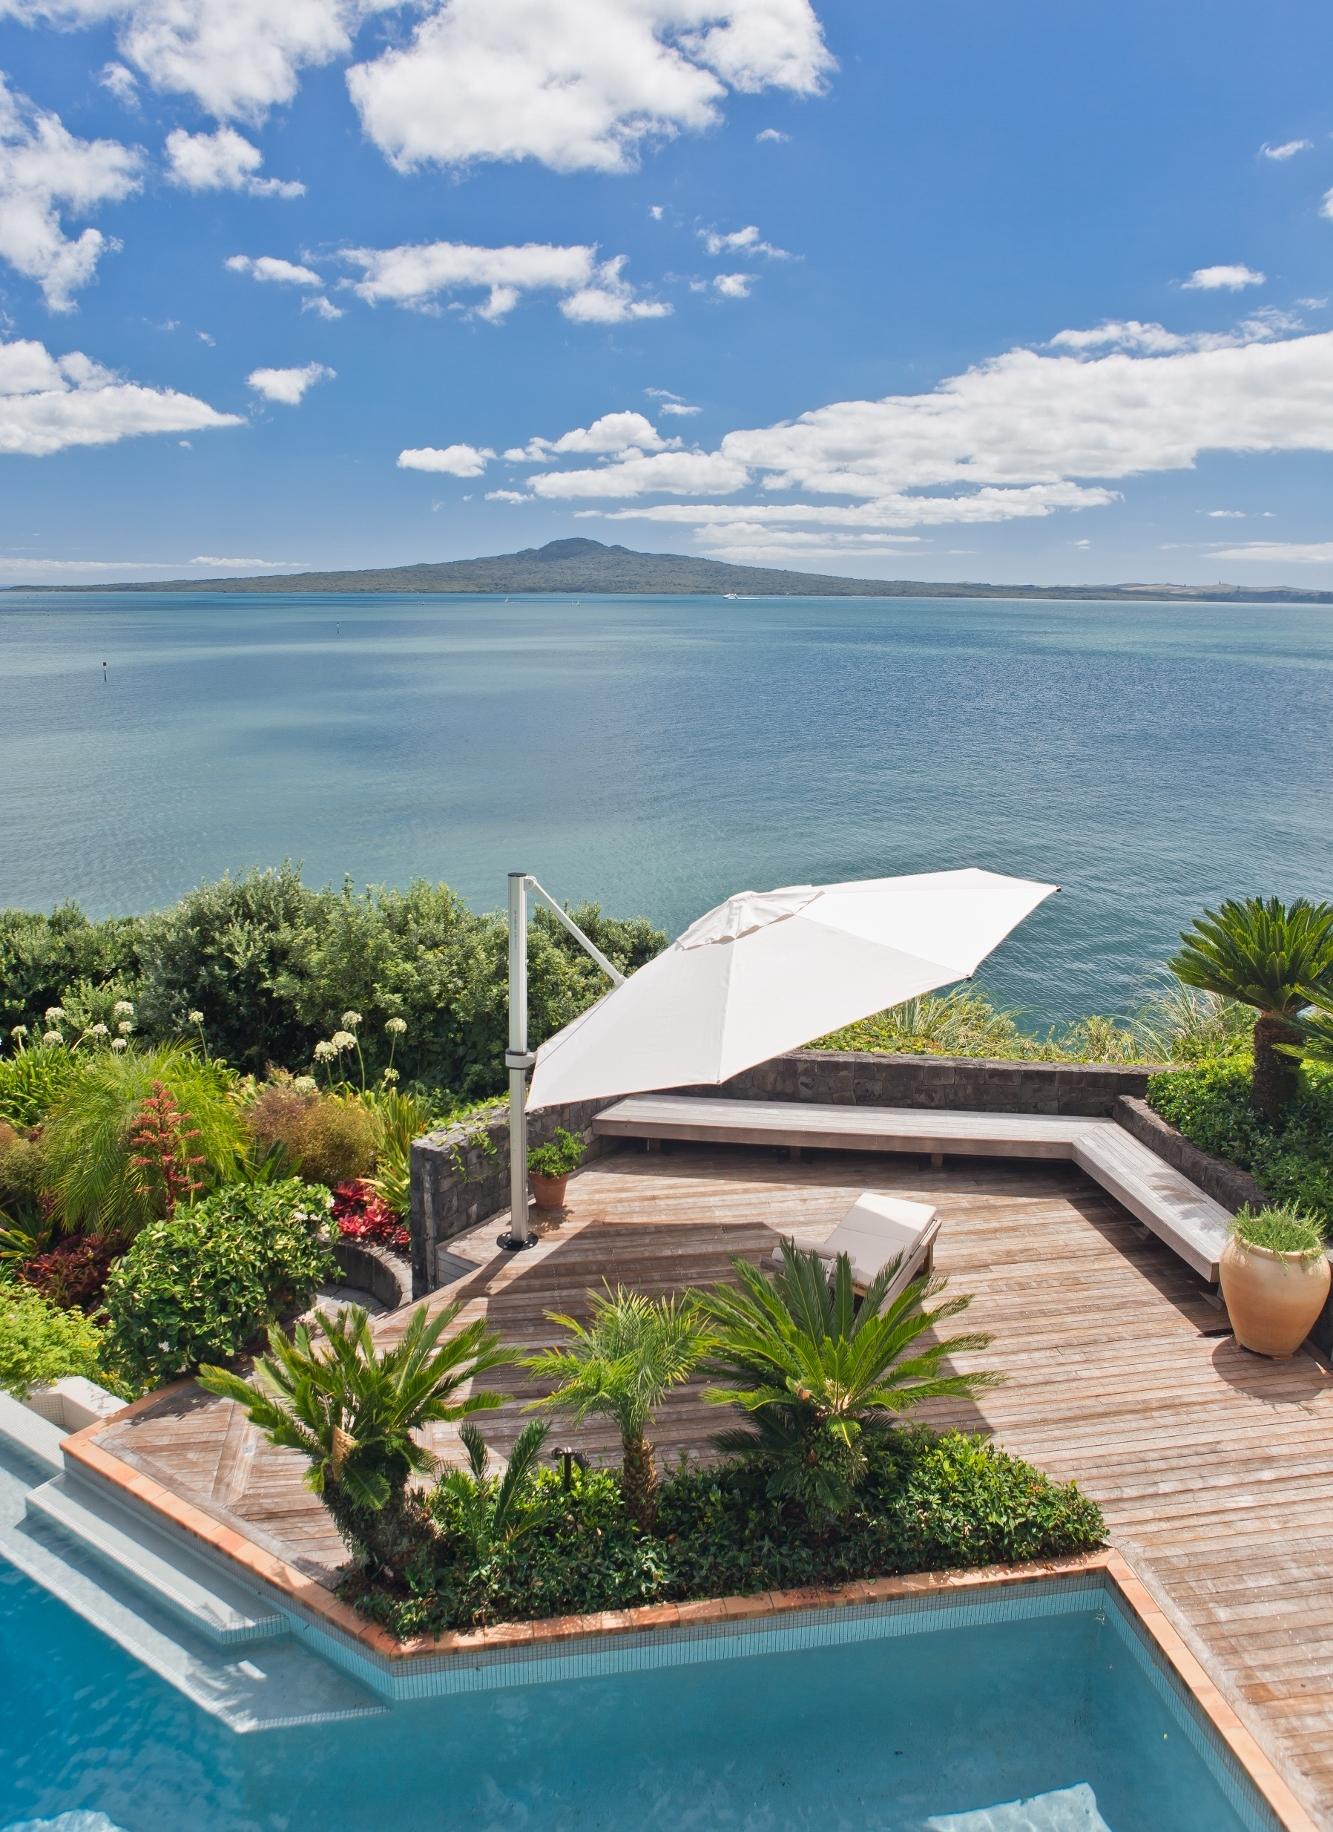 Octagonal Riviera Cantilever Umbrella Mission Bay Auckland